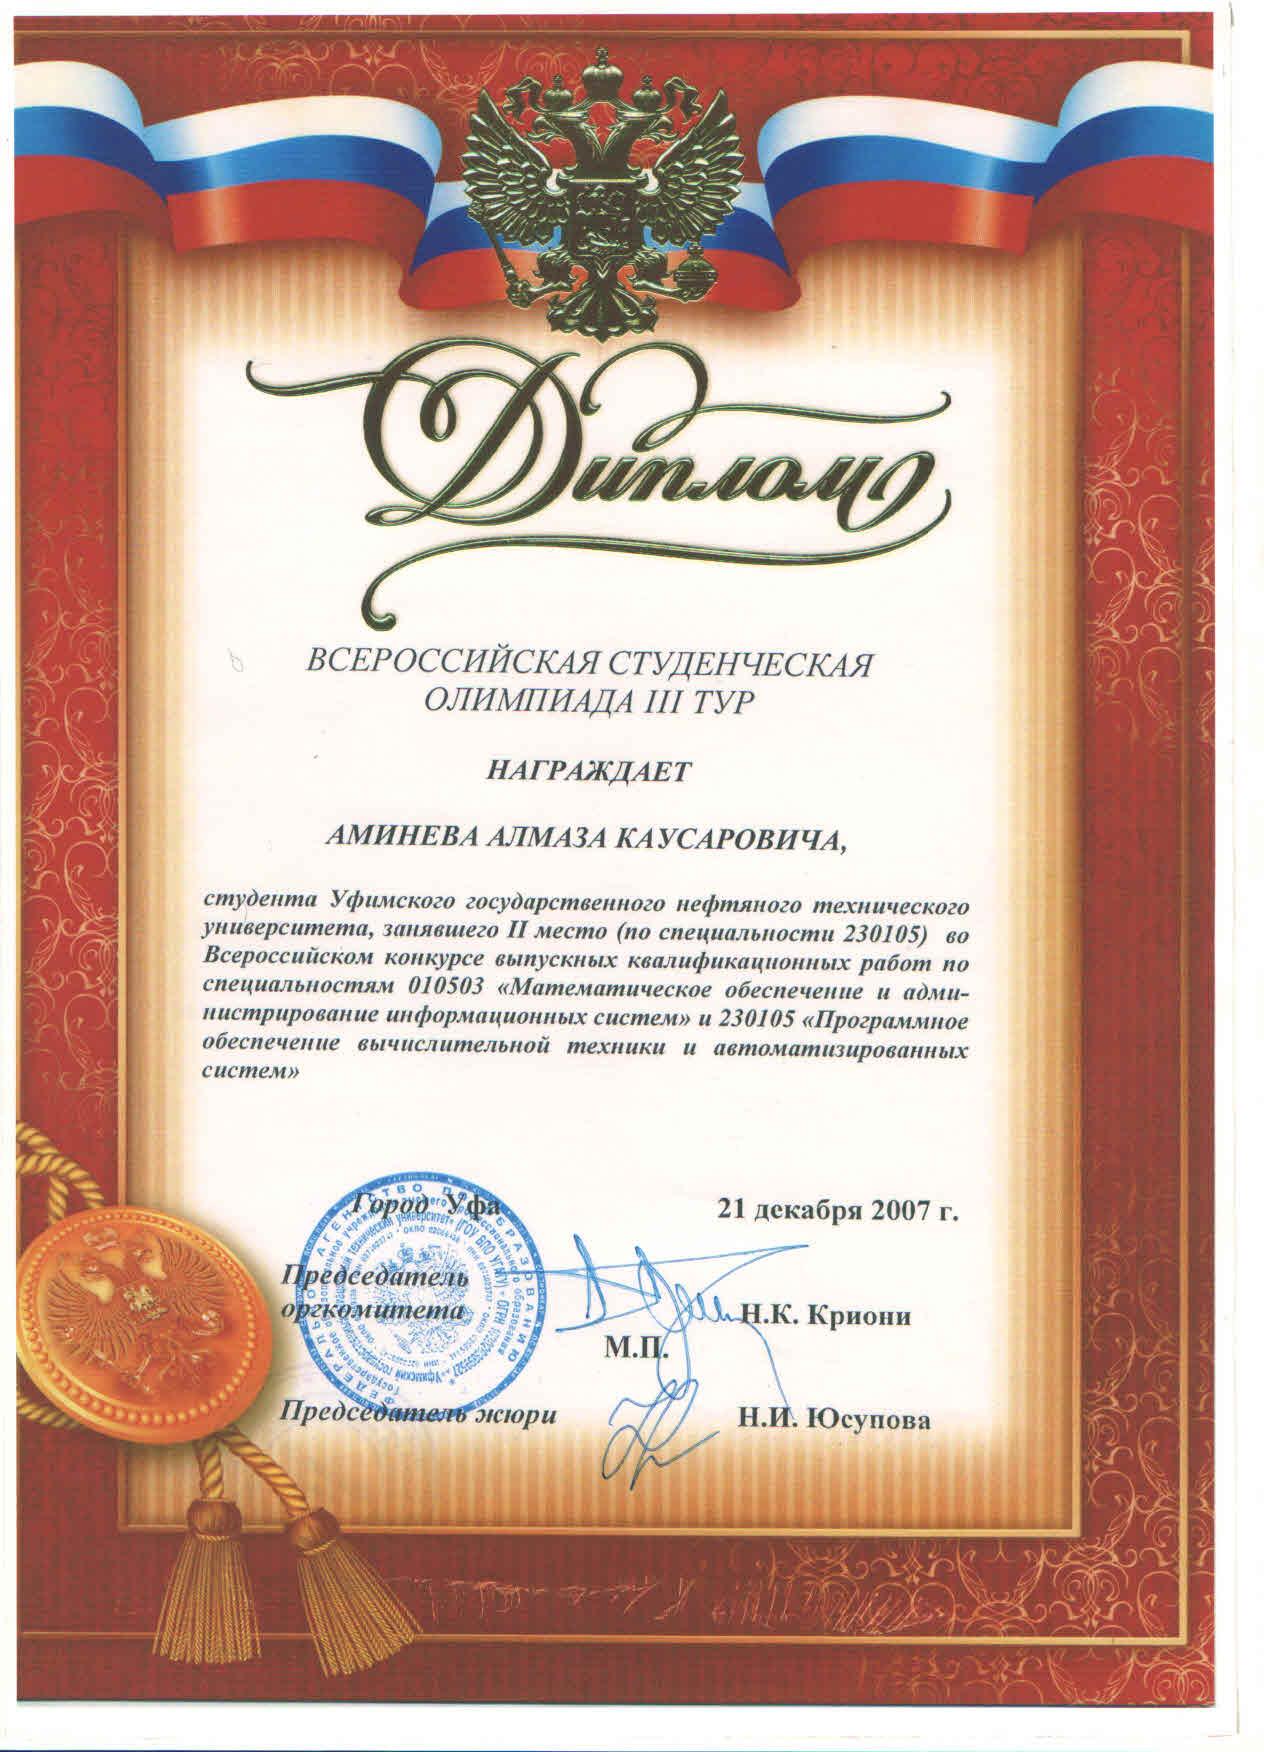 Аминев, #кафедравтик, #ВТИК, #ФАПП, #УГНТУ, #USPTU